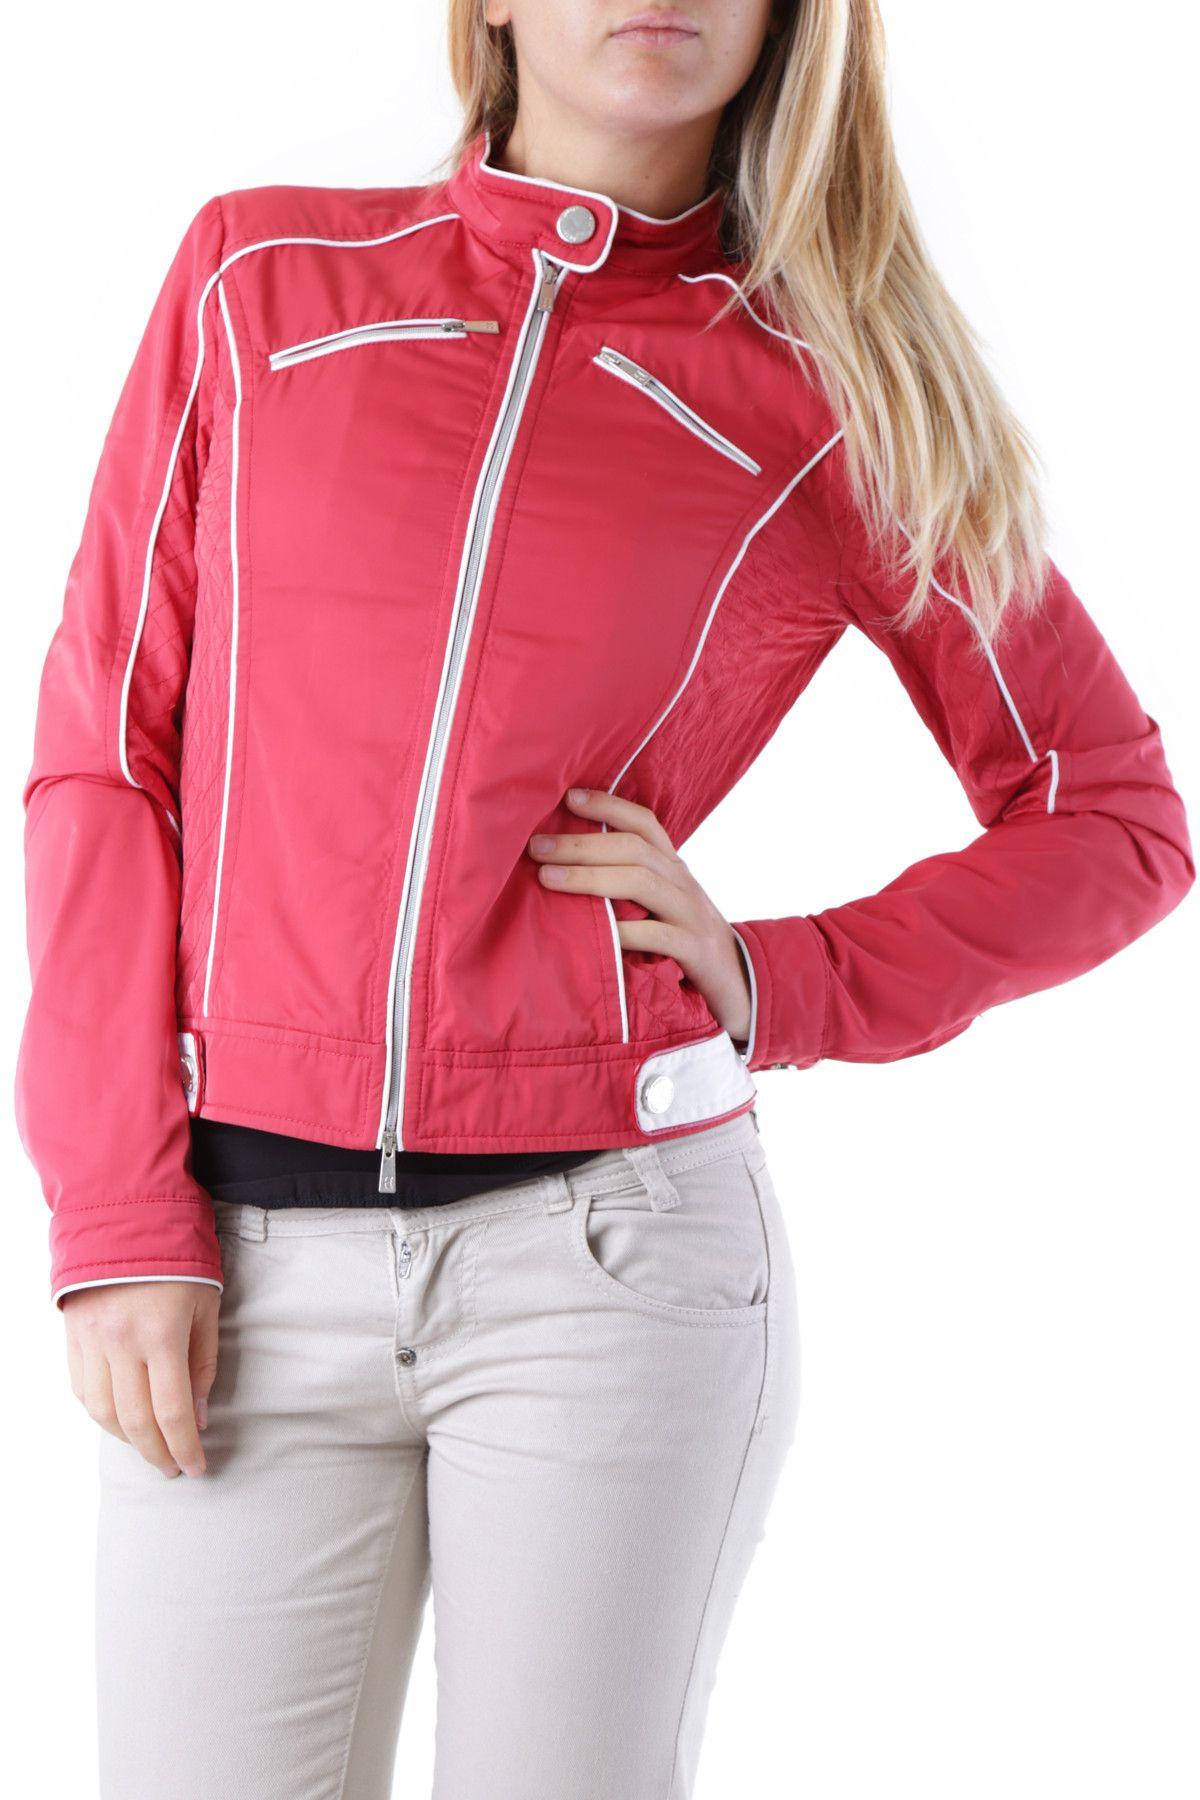 Husky Women's Jacket In Red